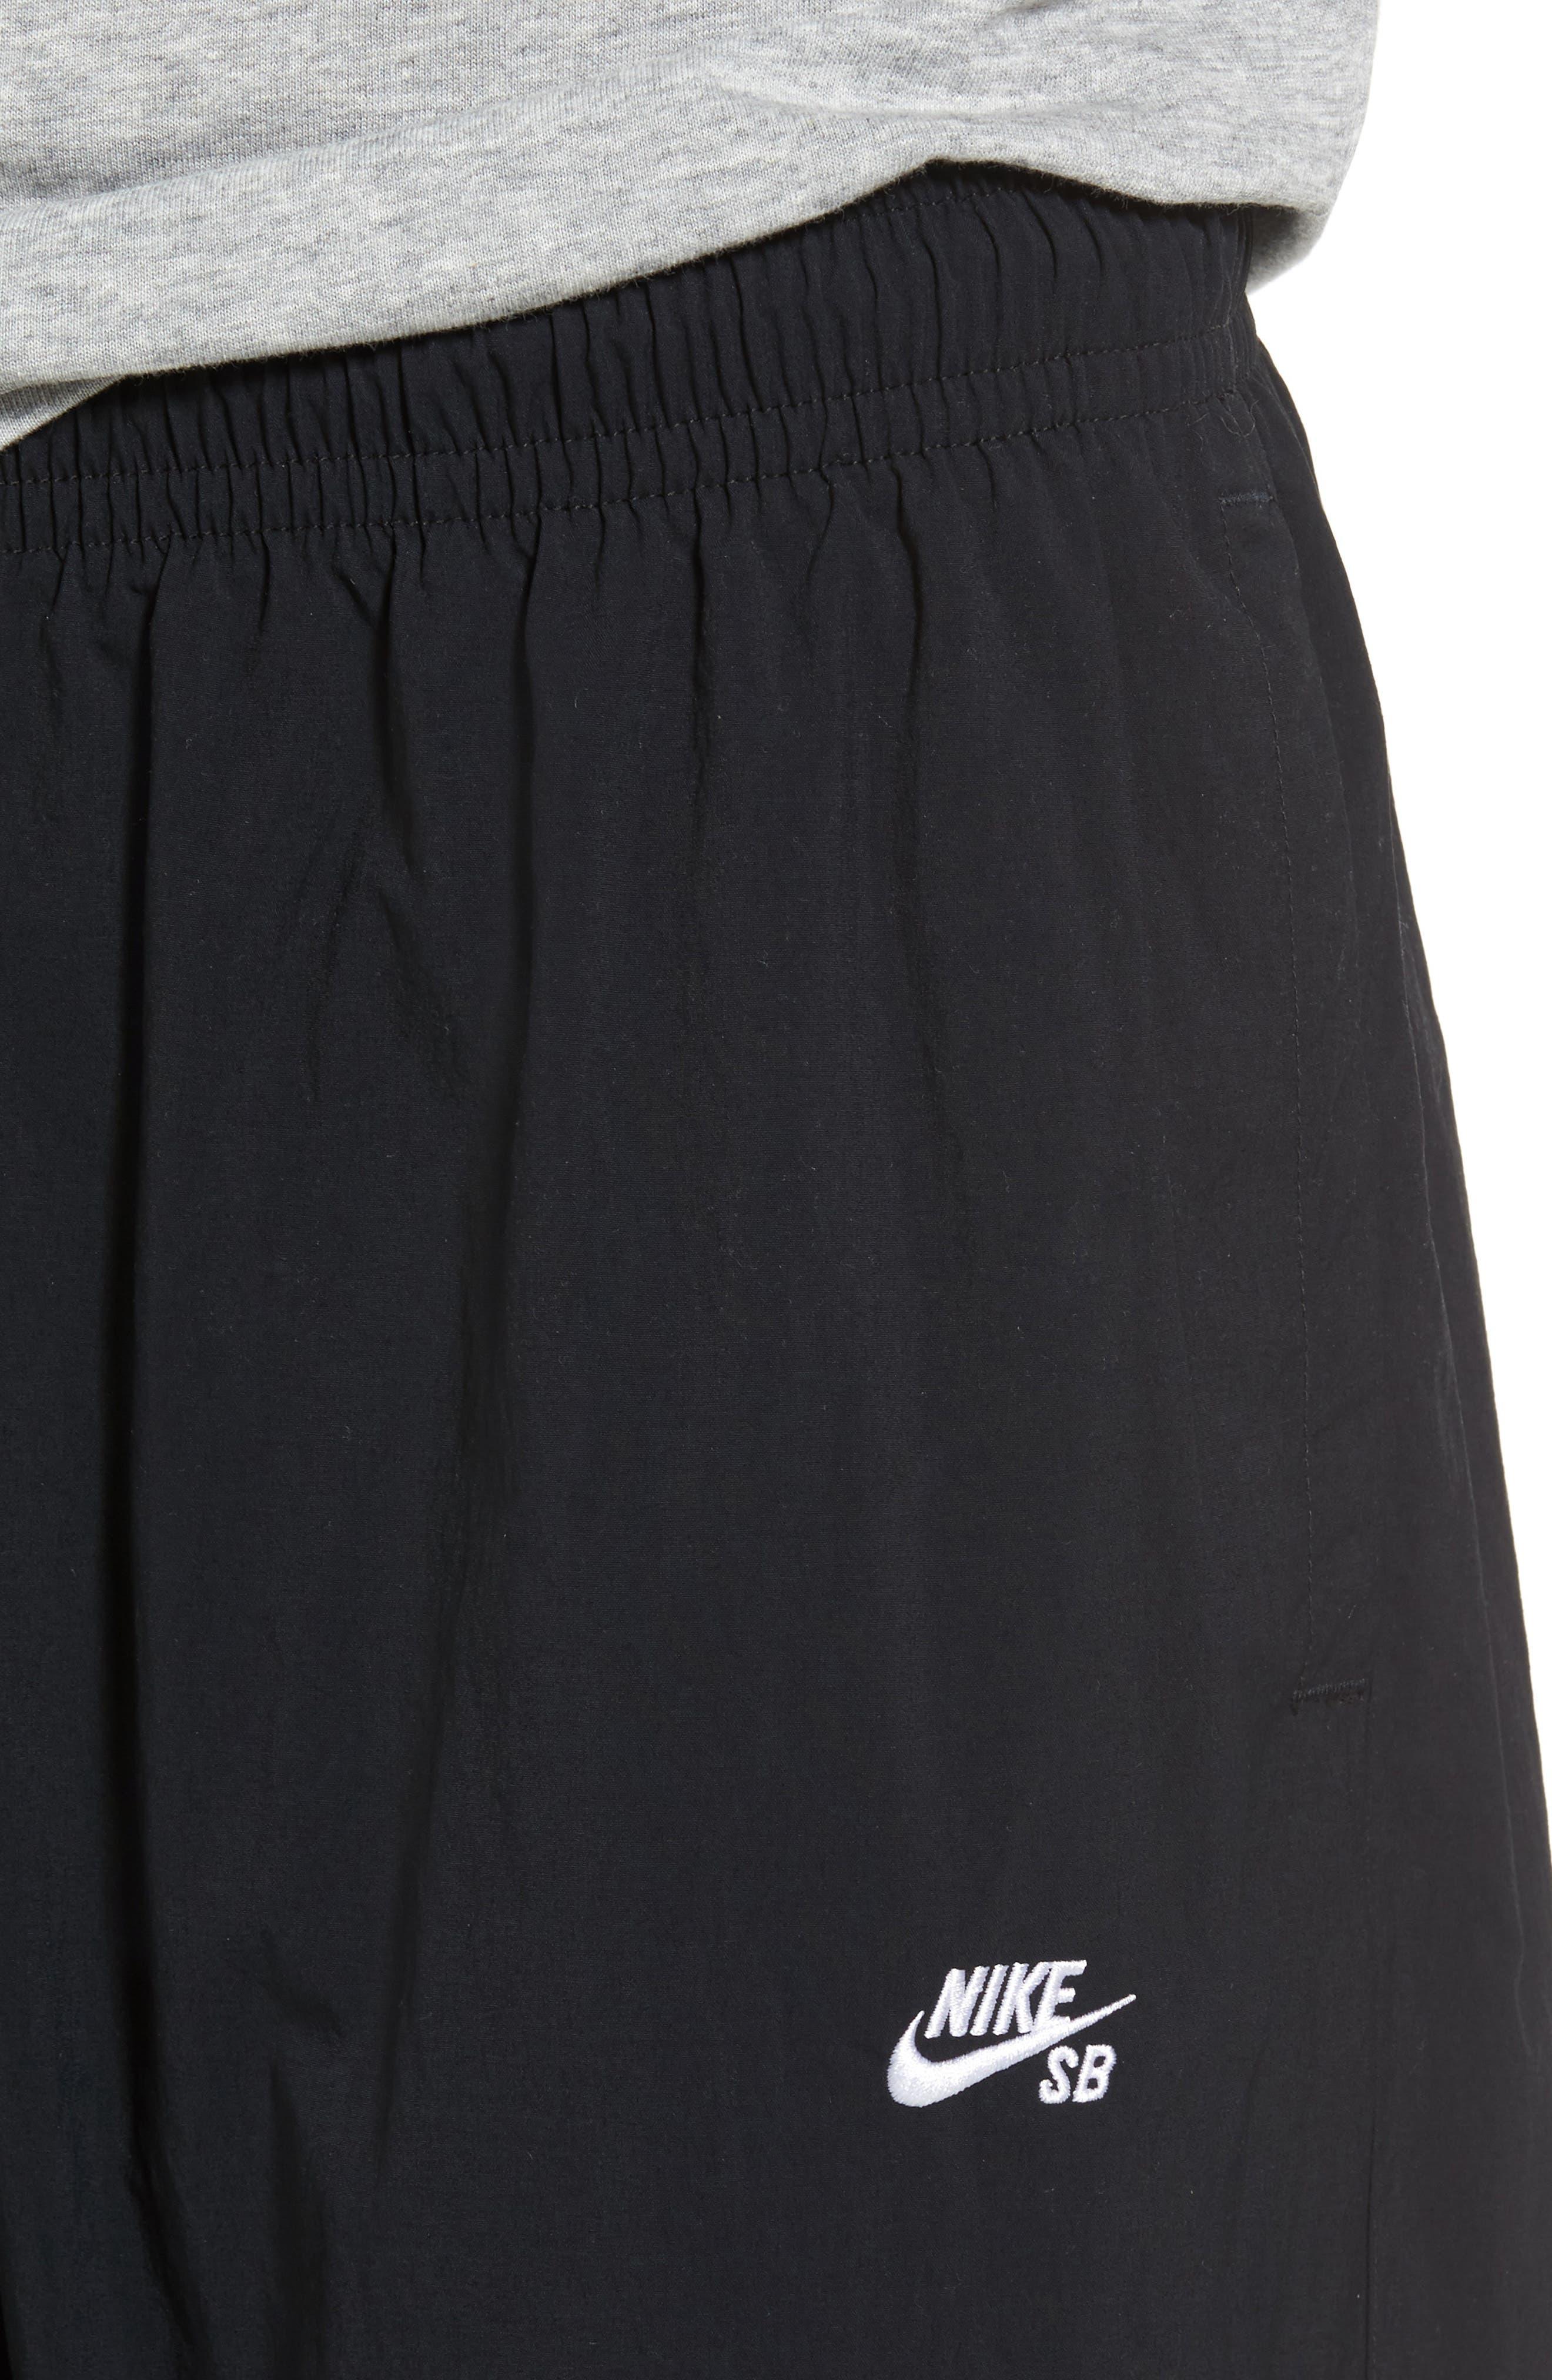 Flex Woven Pants,                             Alternate thumbnail 4, color,                             Black/ White